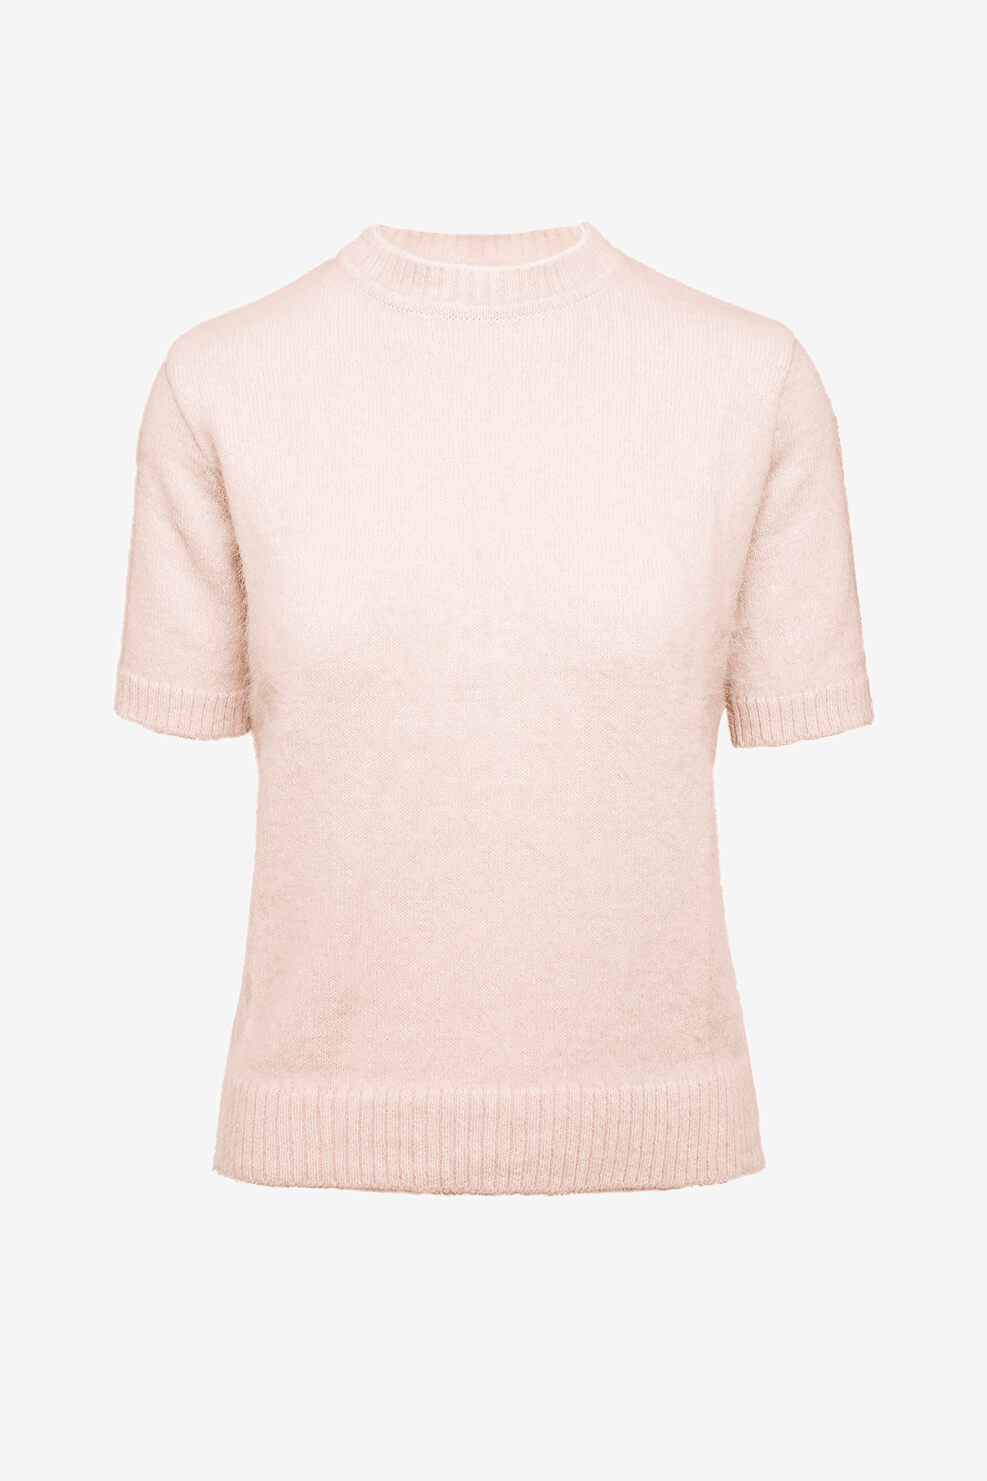 Fuzzy short sleeve knit